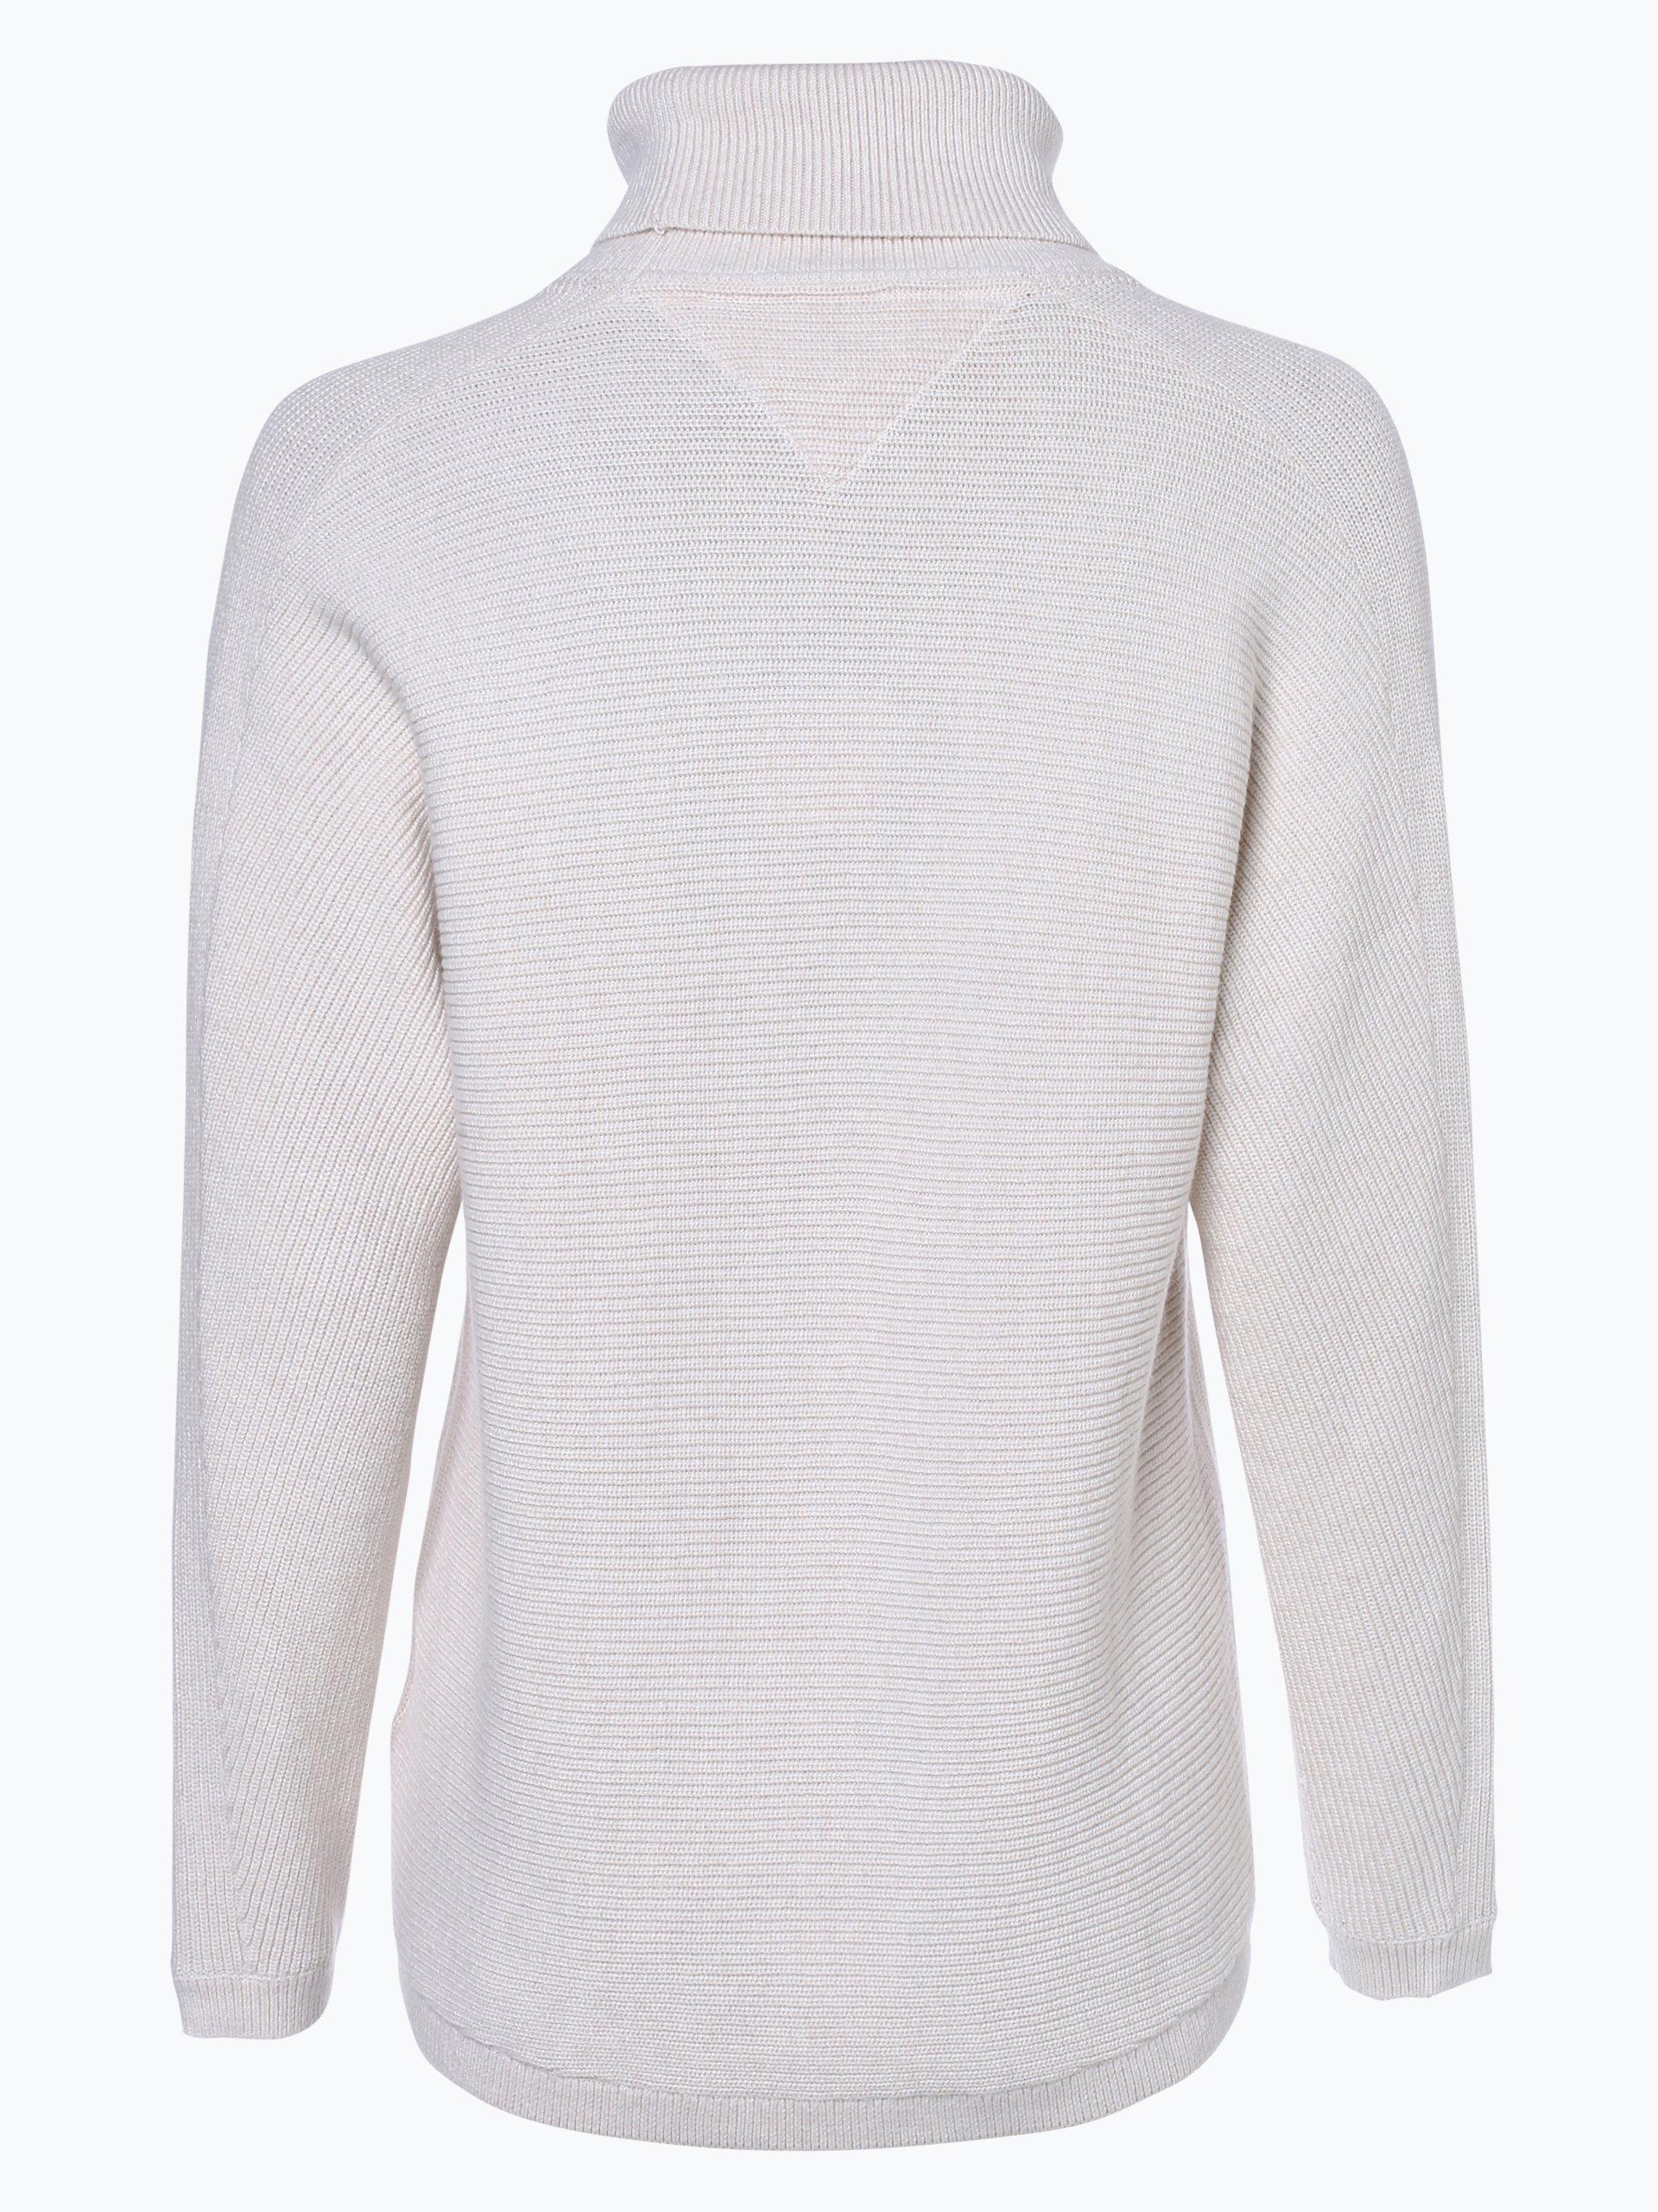 tommy jeans damen pullover ecru uni online kaufen peek. Black Bedroom Furniture Sets. Home Design Ideas